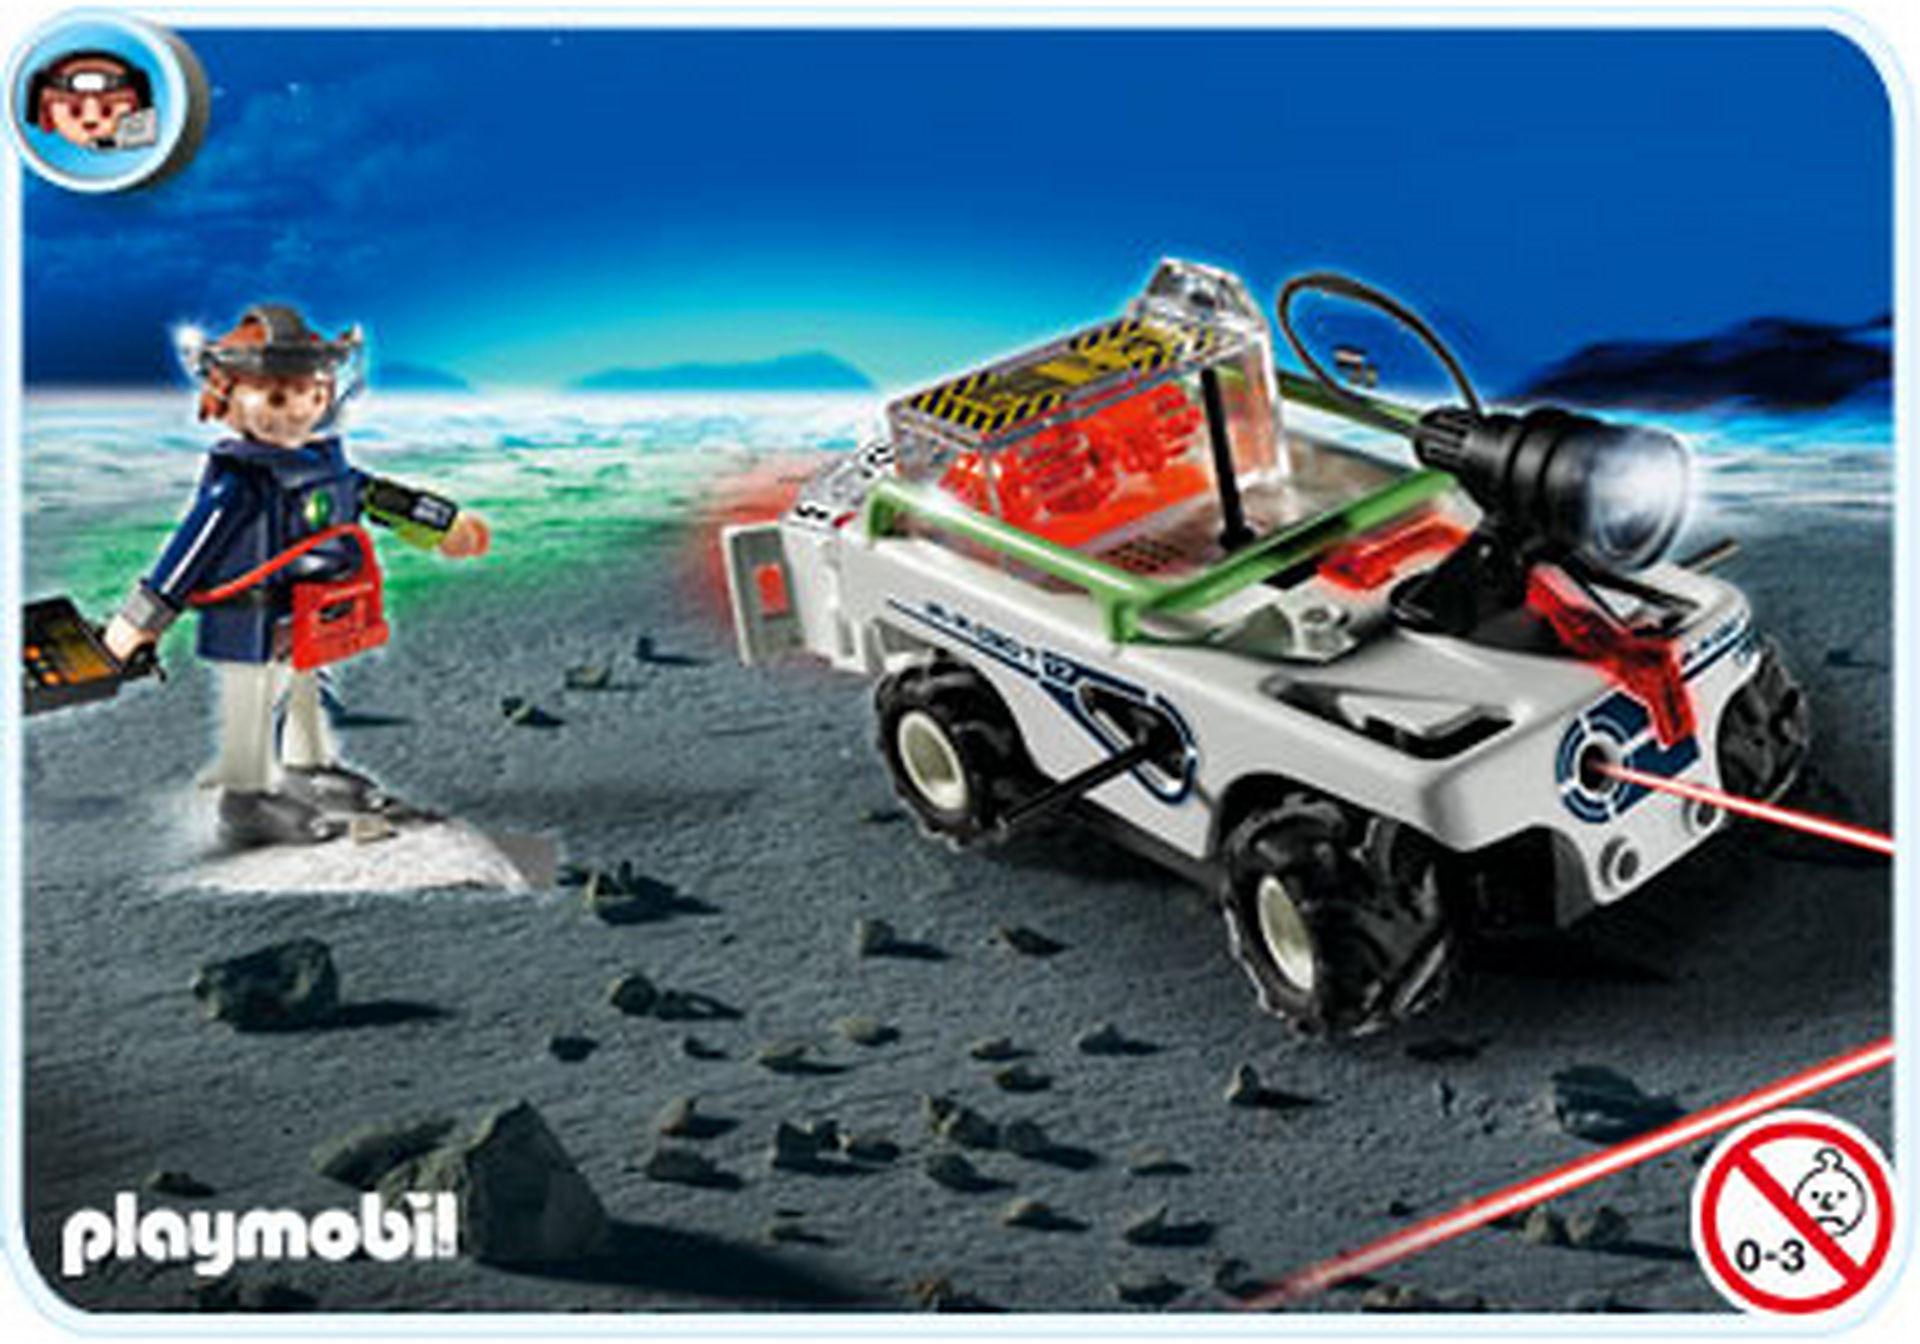 5151-A Explorer mit K.O.-Leuchtkanone zoom image1